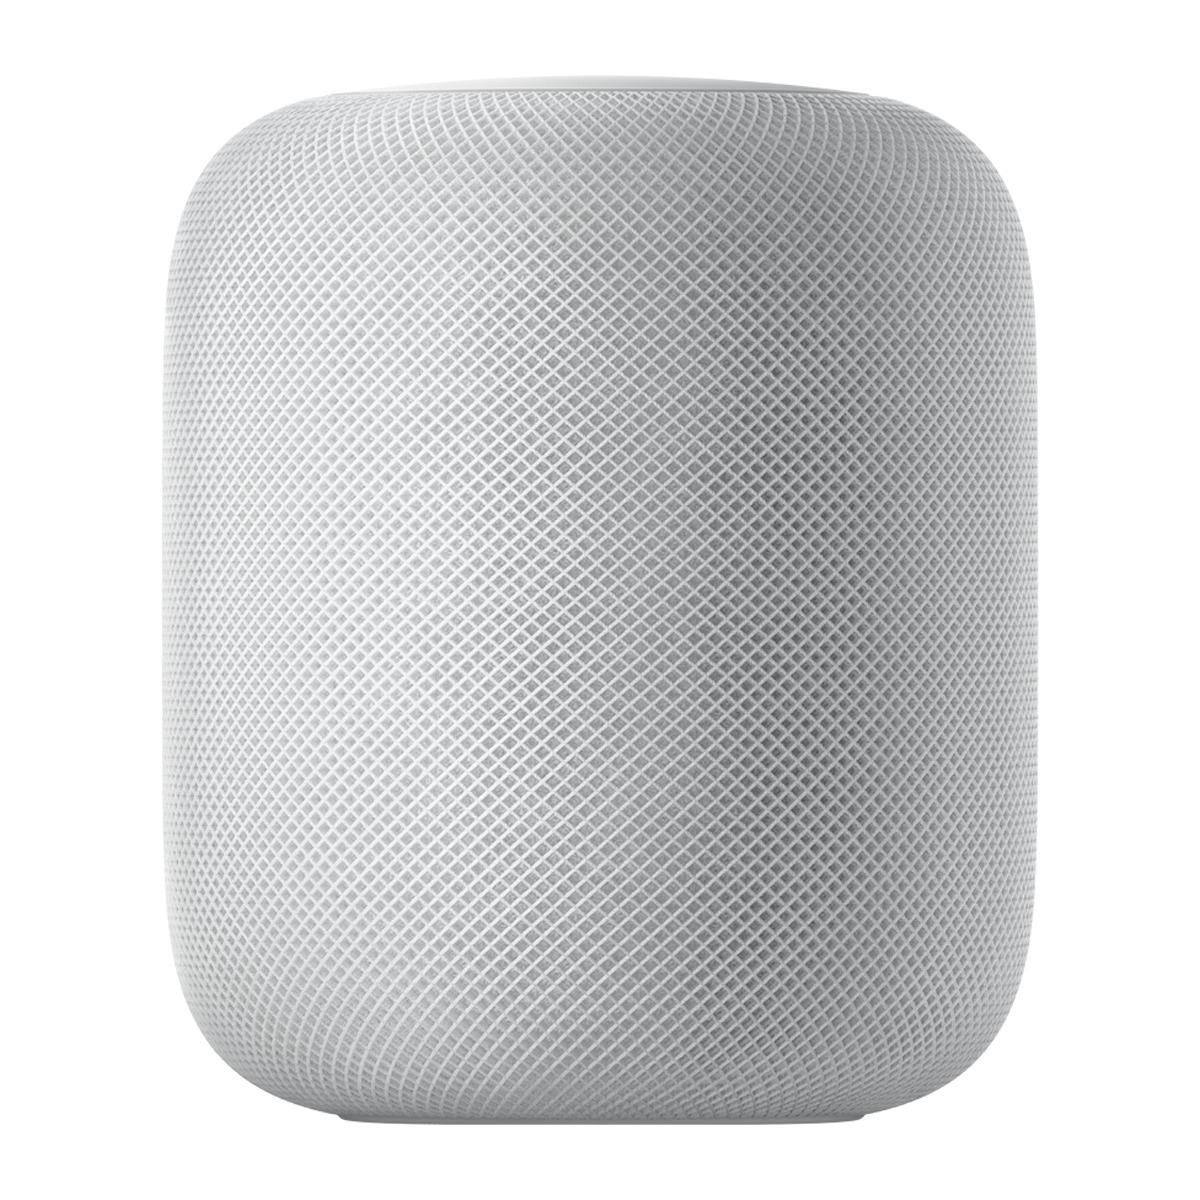 Altavoz inteligente Apple HomePod Blanco Bluetooth Apple Music y Siri